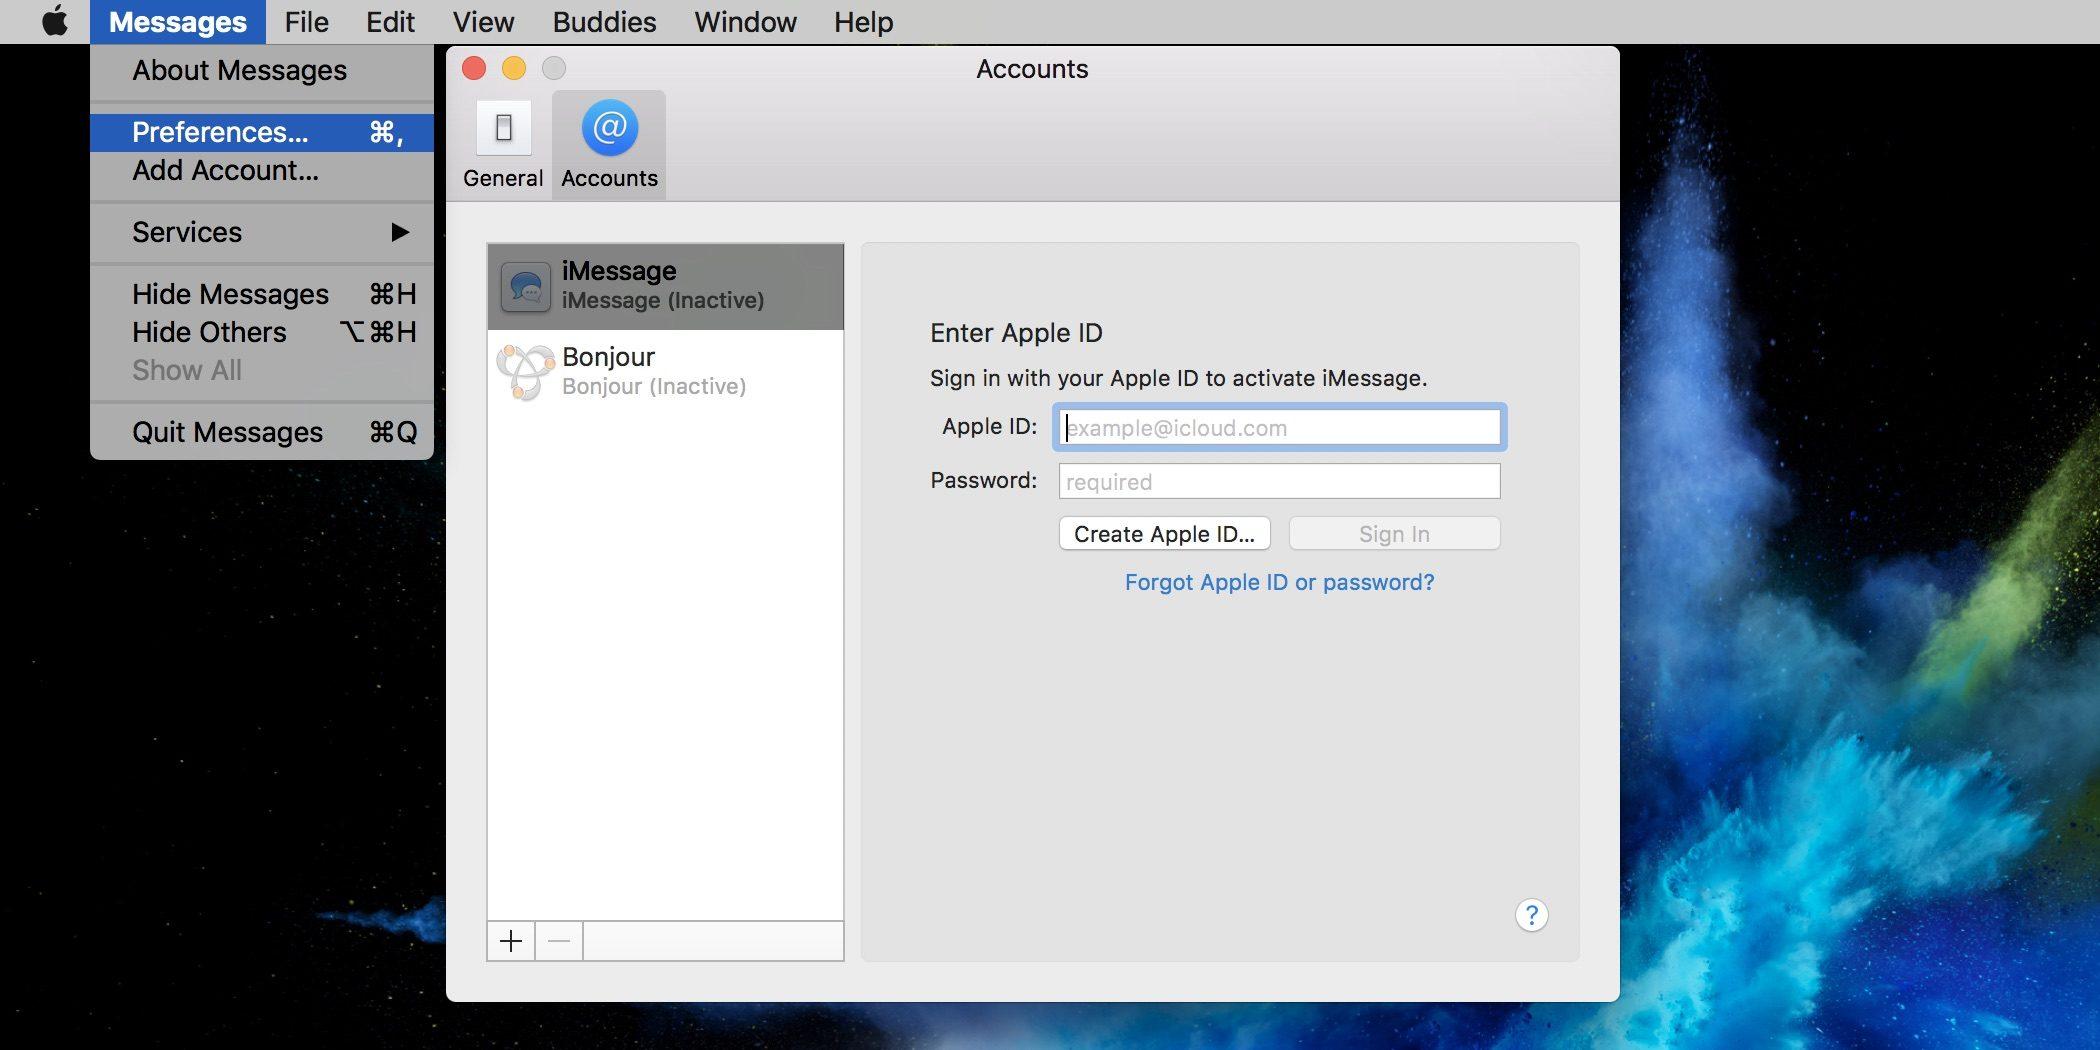 "<span href=""https://9to5mac.com/2017/05/07/how-to-get-text-messages-on-your-mac/"">Cómo recibir mensajes de texto en tu Mac</a>"